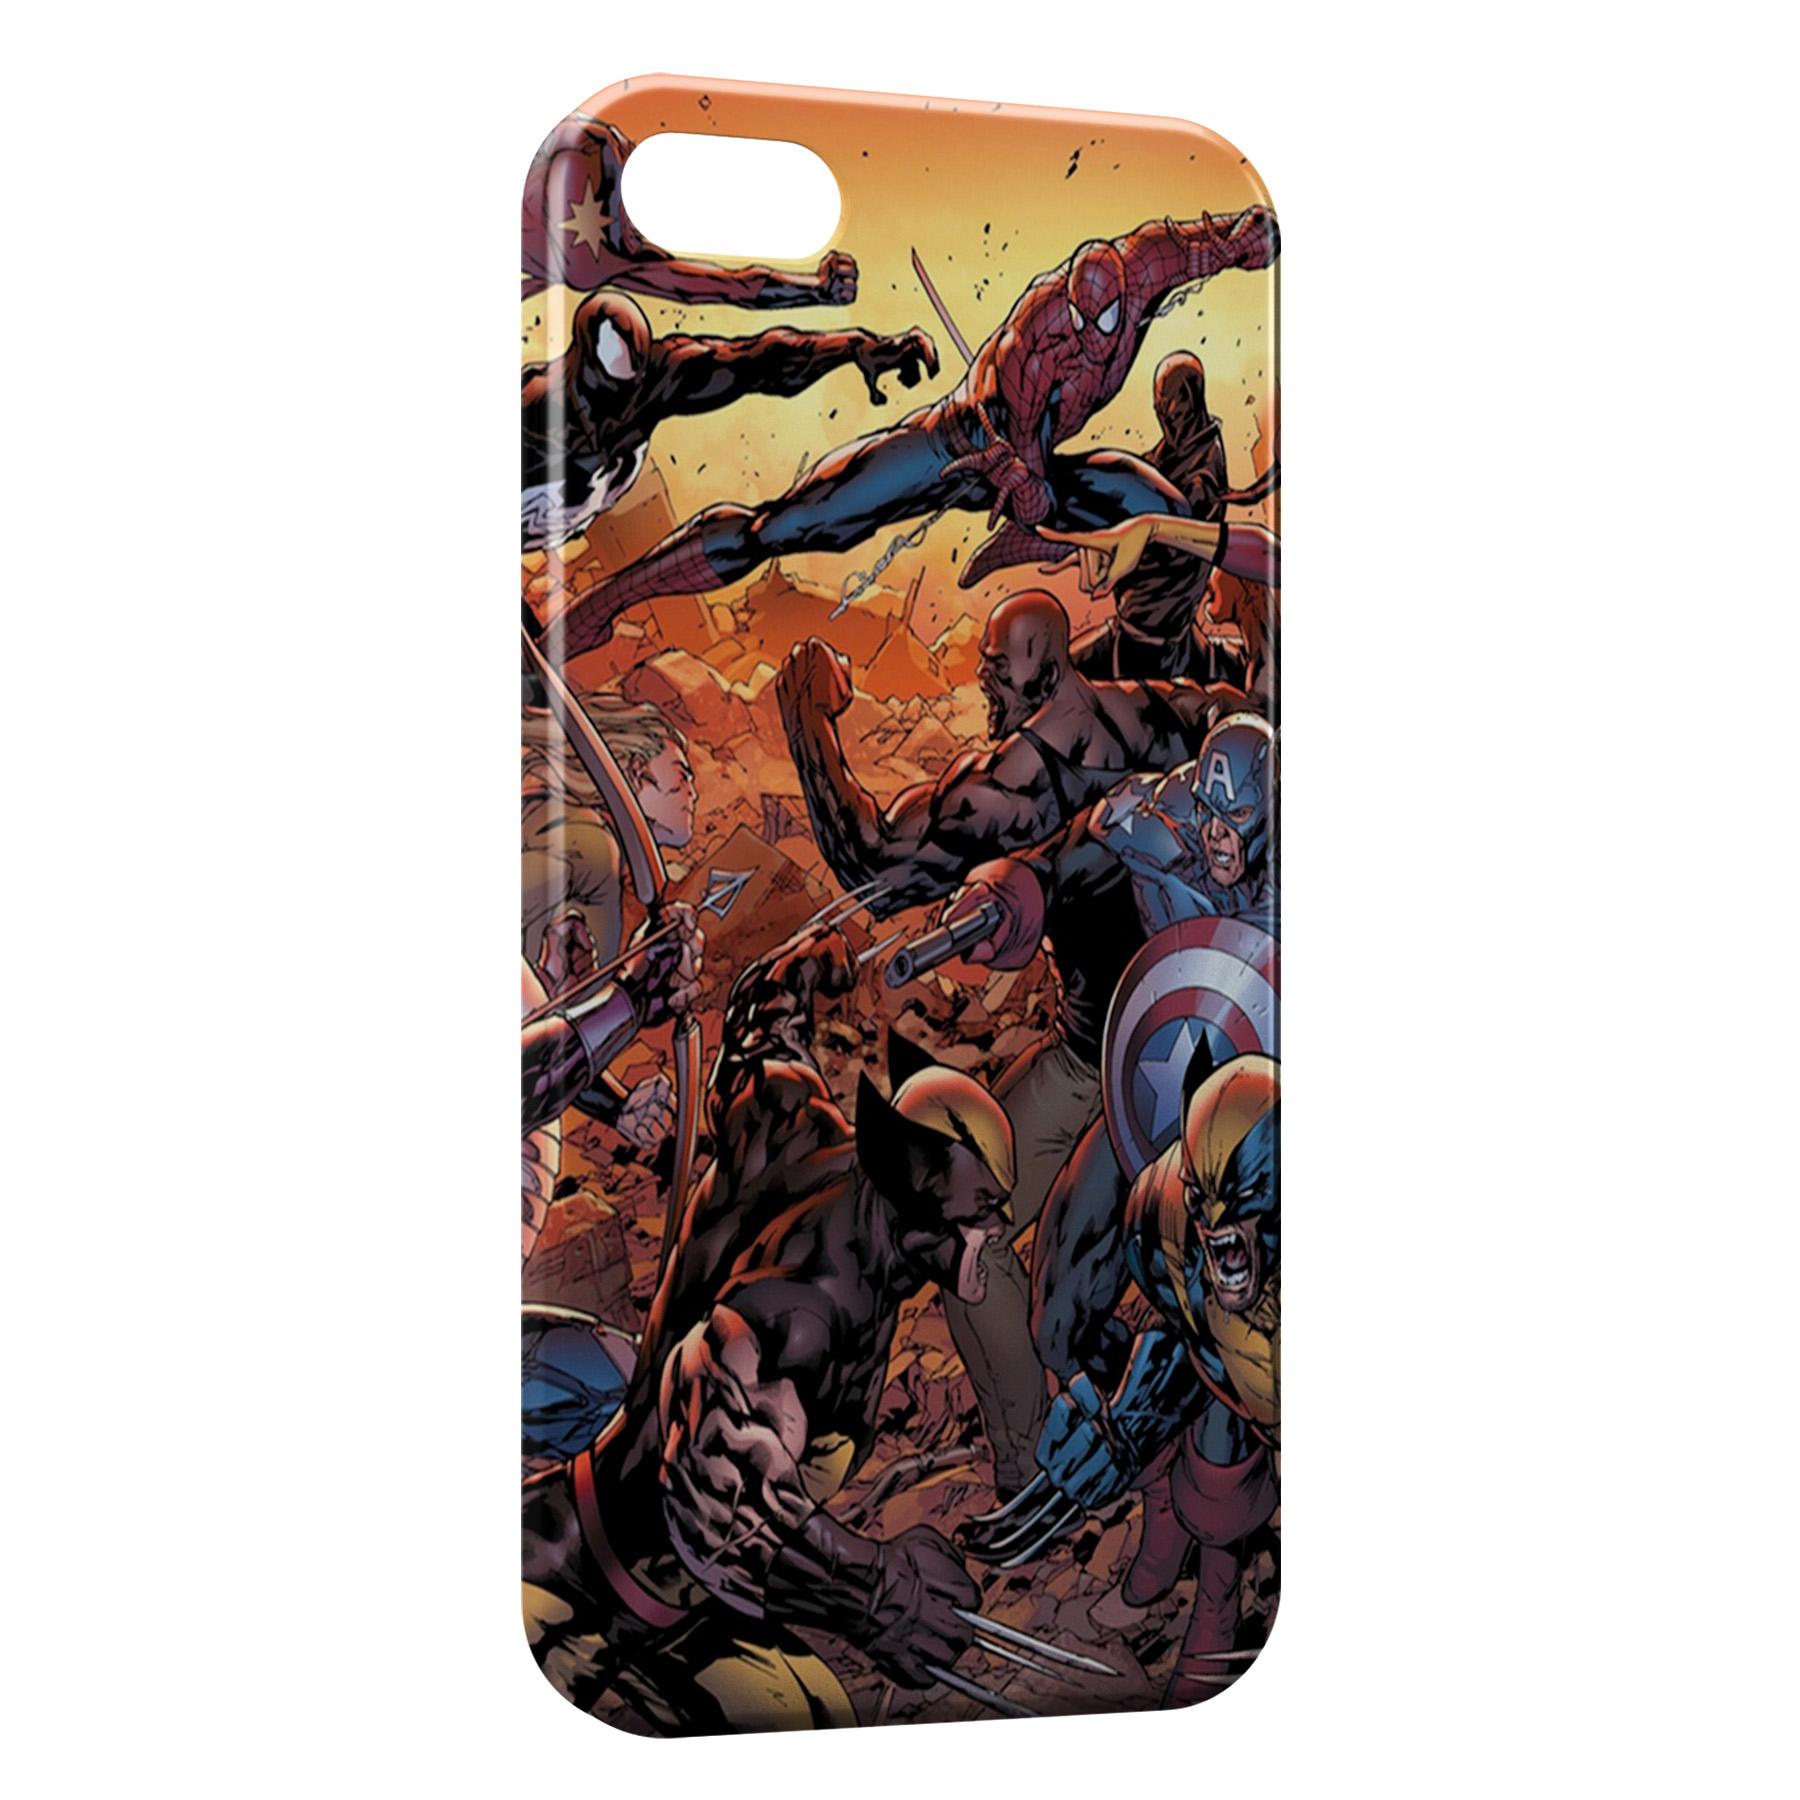 Coque iPhone 7 & 7 Plus The Avengers